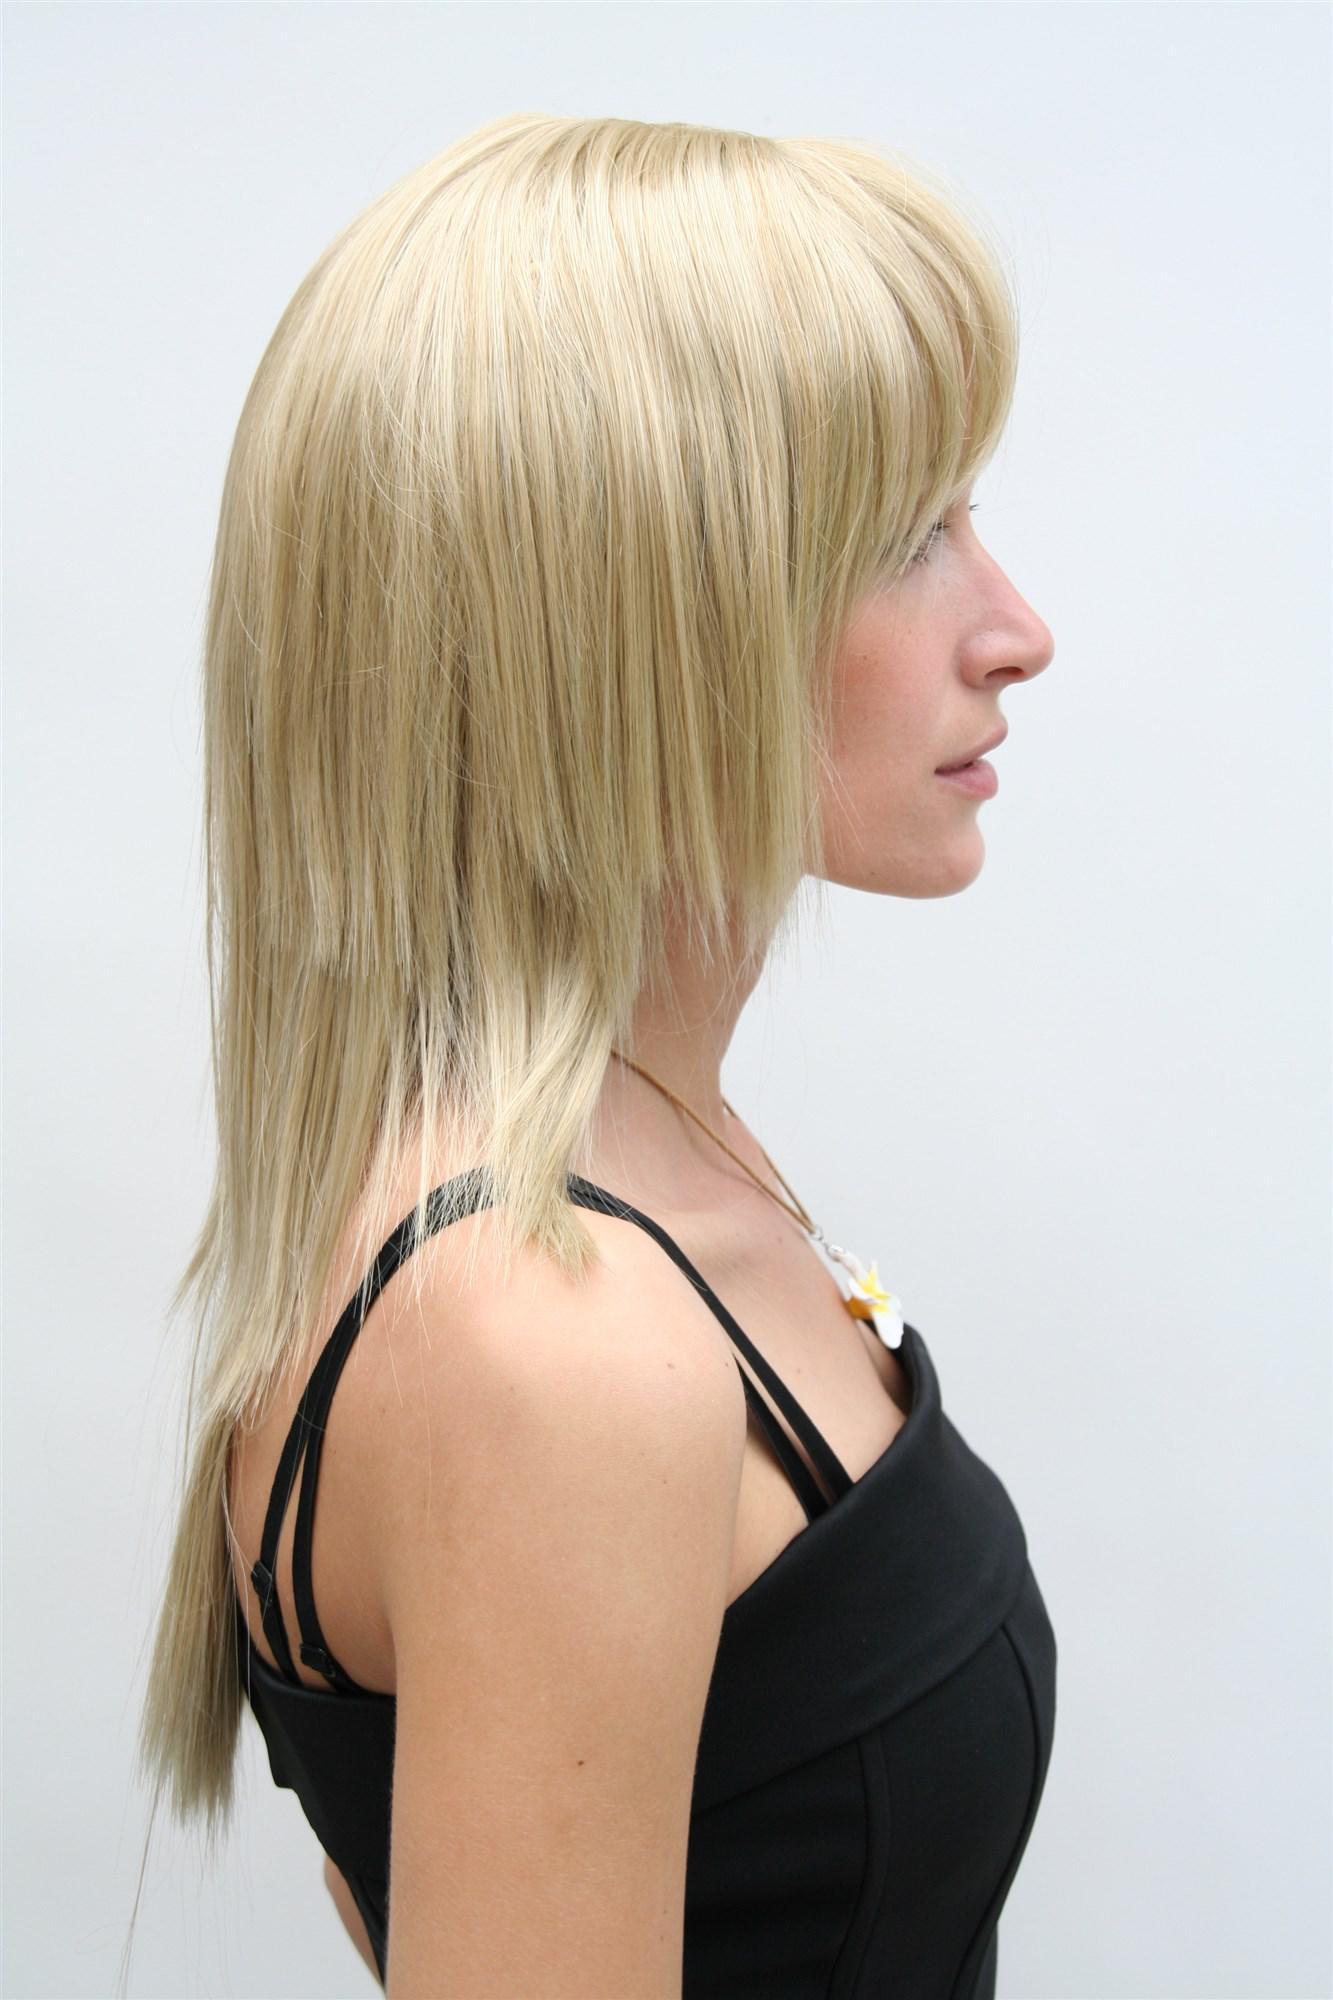 damenperücke, blond, stark gestuft, pony, lang, haarersatz, ca. 55